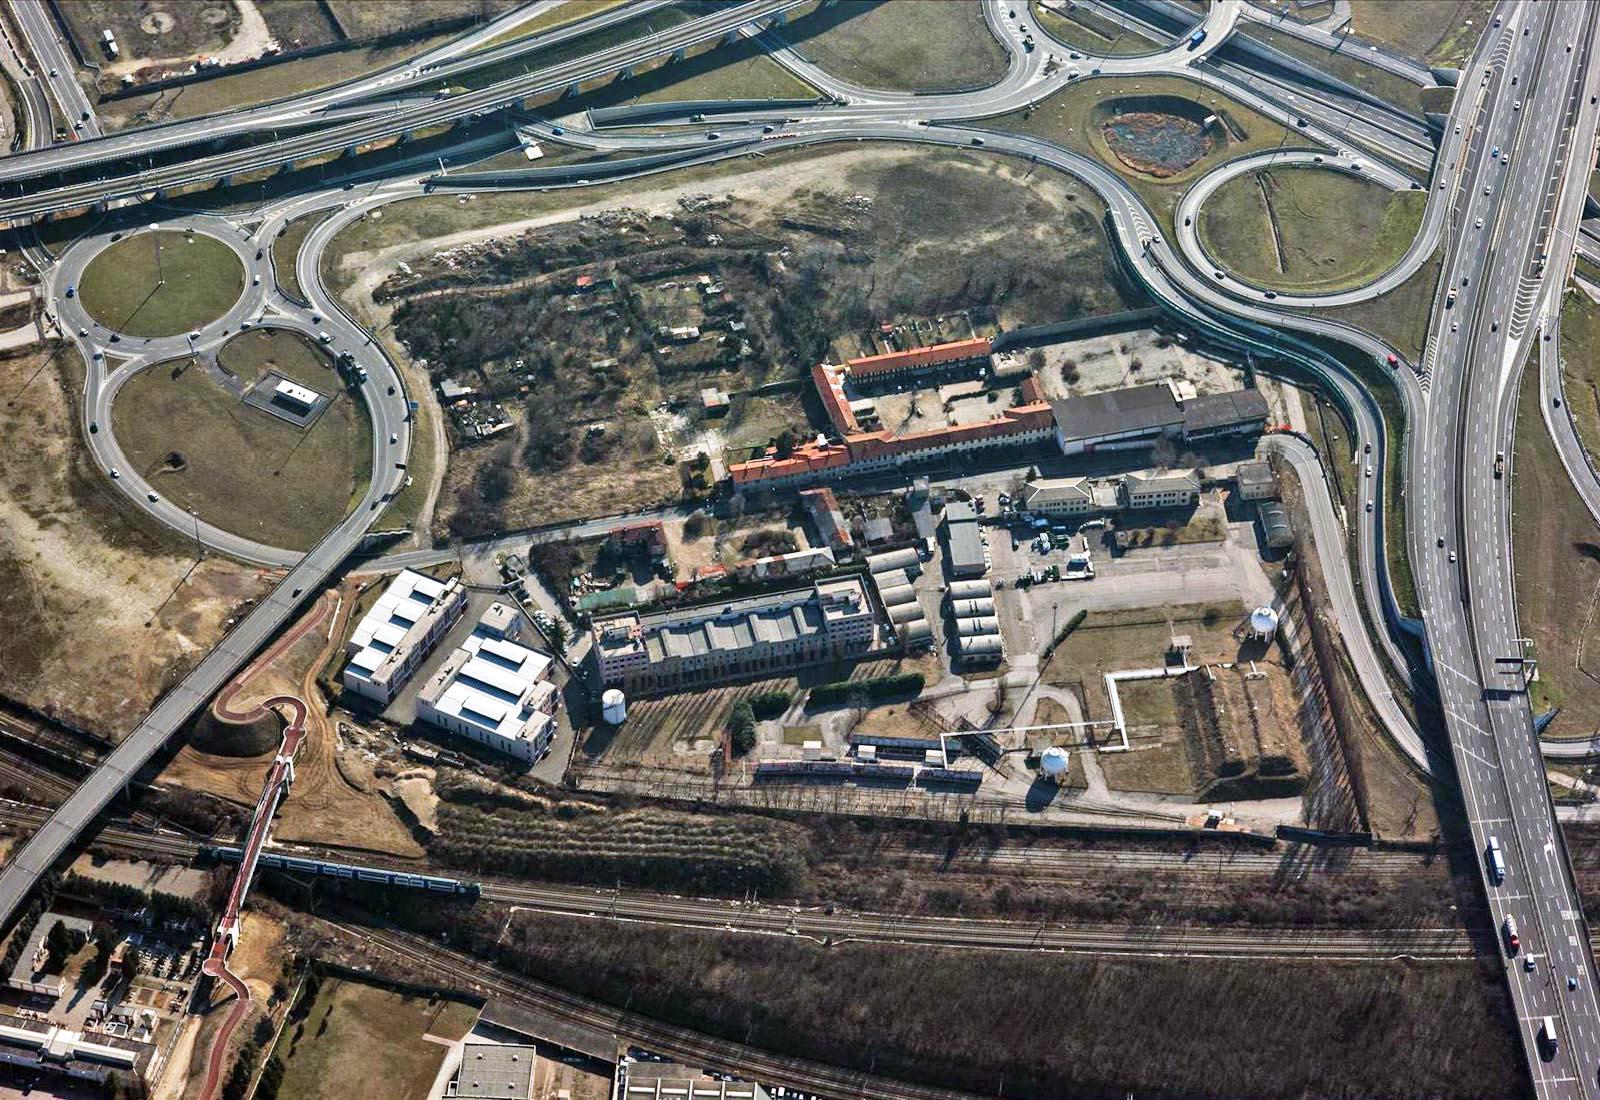 PII Pantanedo Time Town a Rho - Vista aerea dell'area di intervento